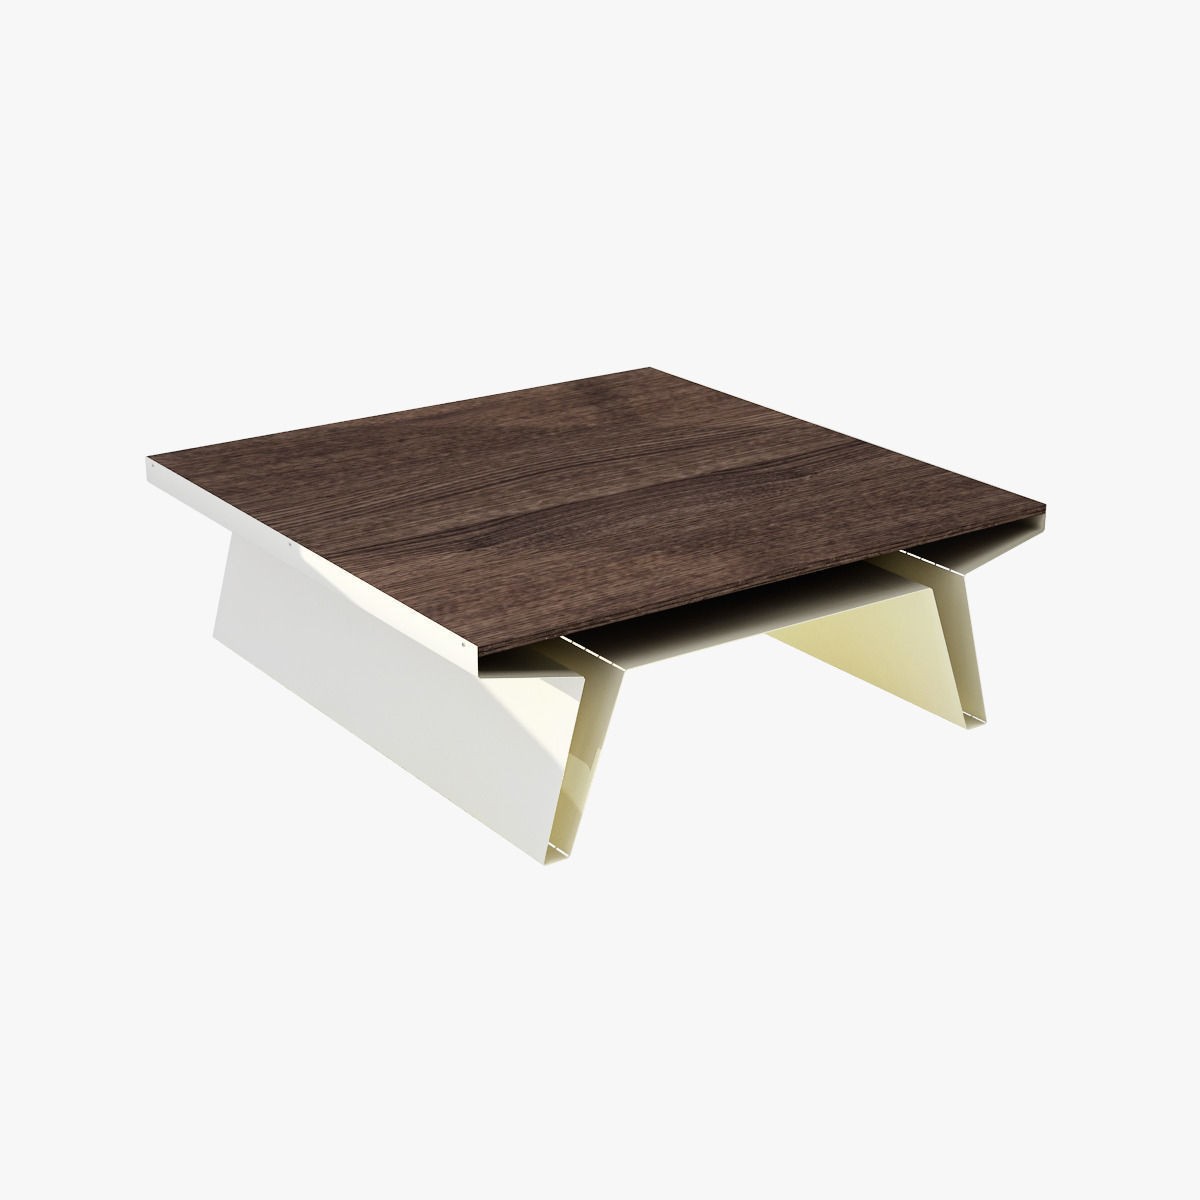 Modern barbarella square cocktail table 3d model max for Square cocktail table